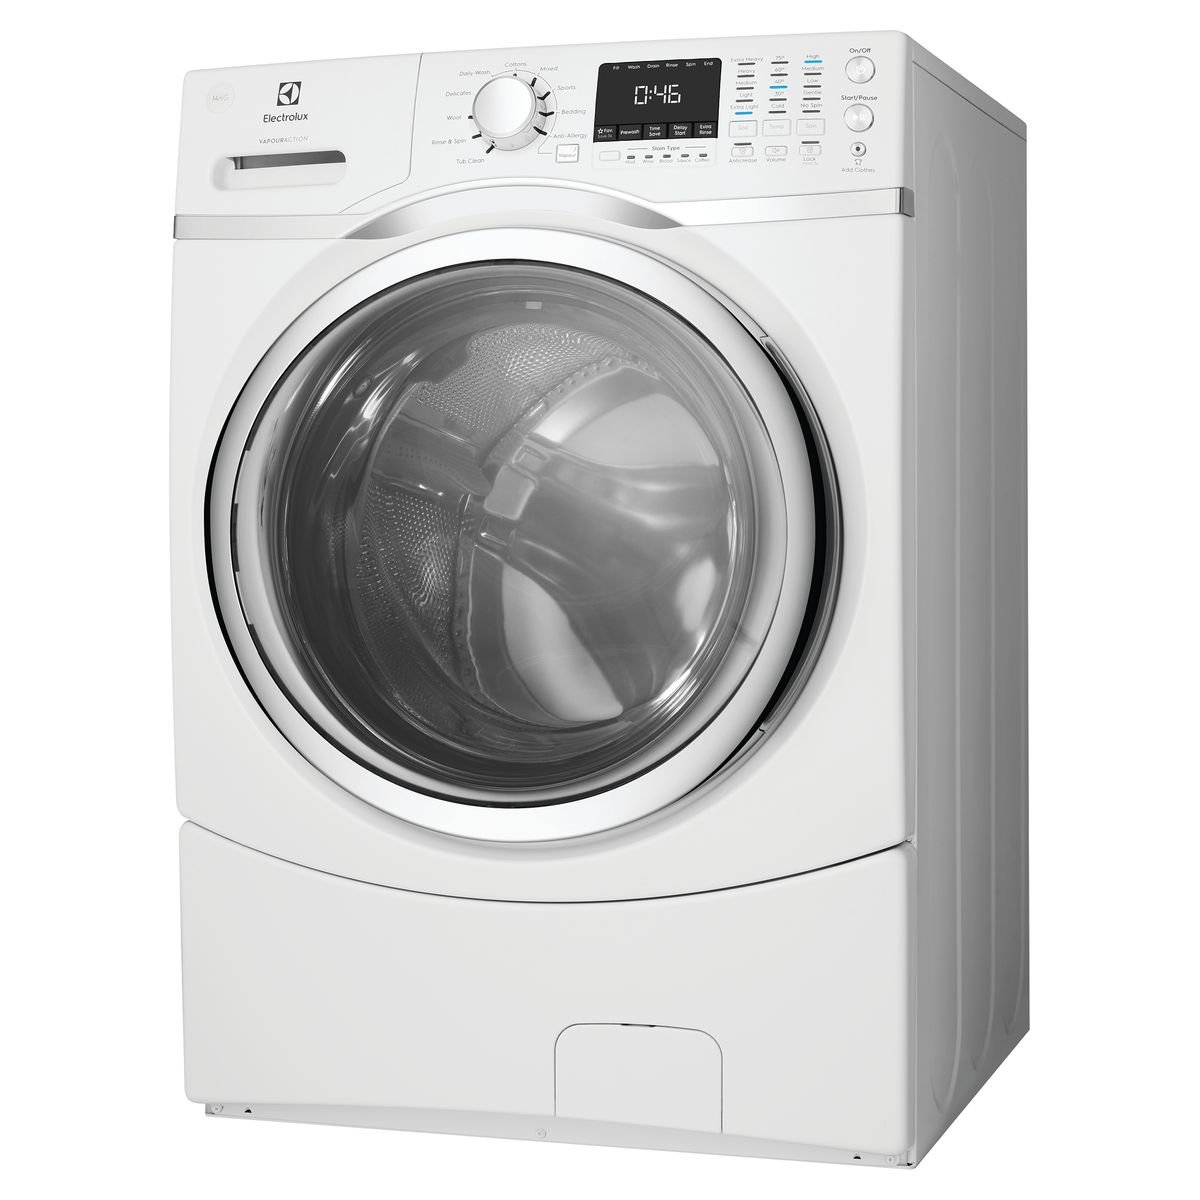 NEW Electrolux 14kg Front Load Washing Machine EWF1408B1WA ...